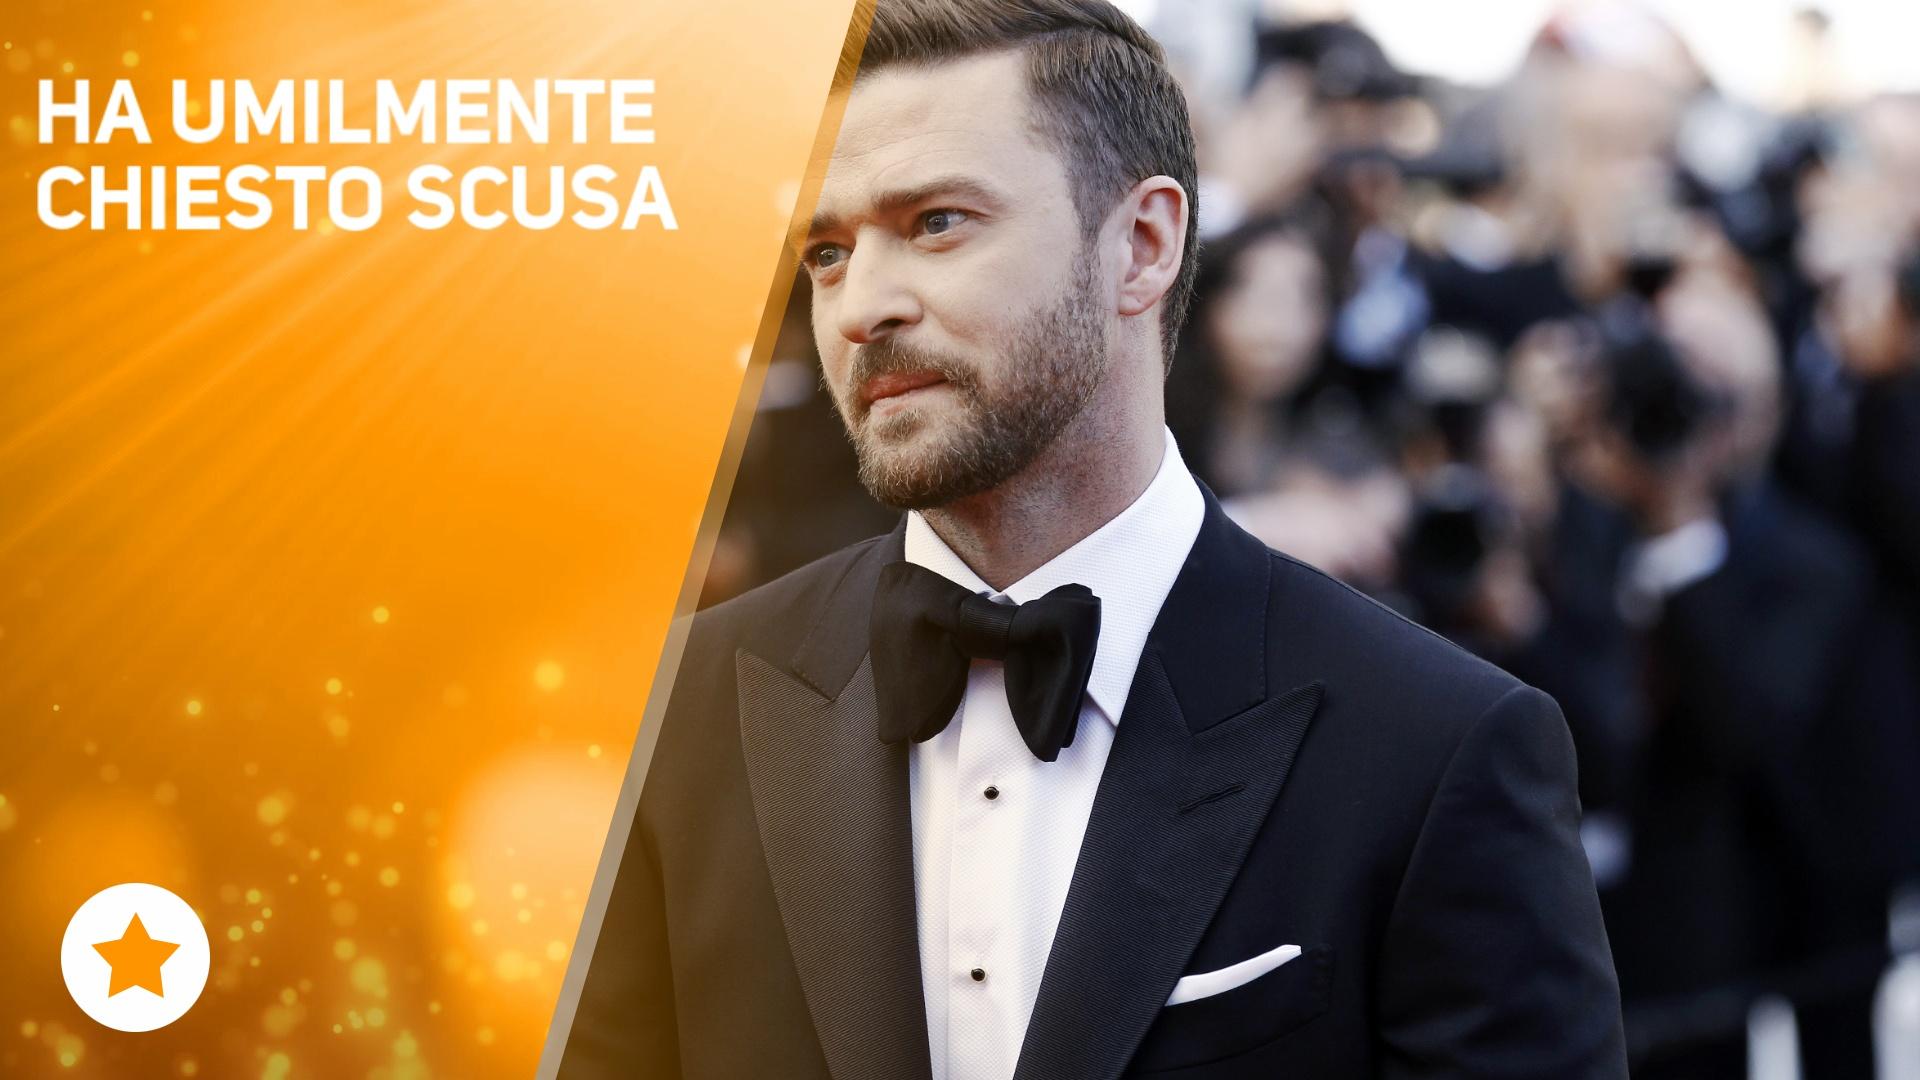 Nessuna pieta' per Justin Timberlake sui social